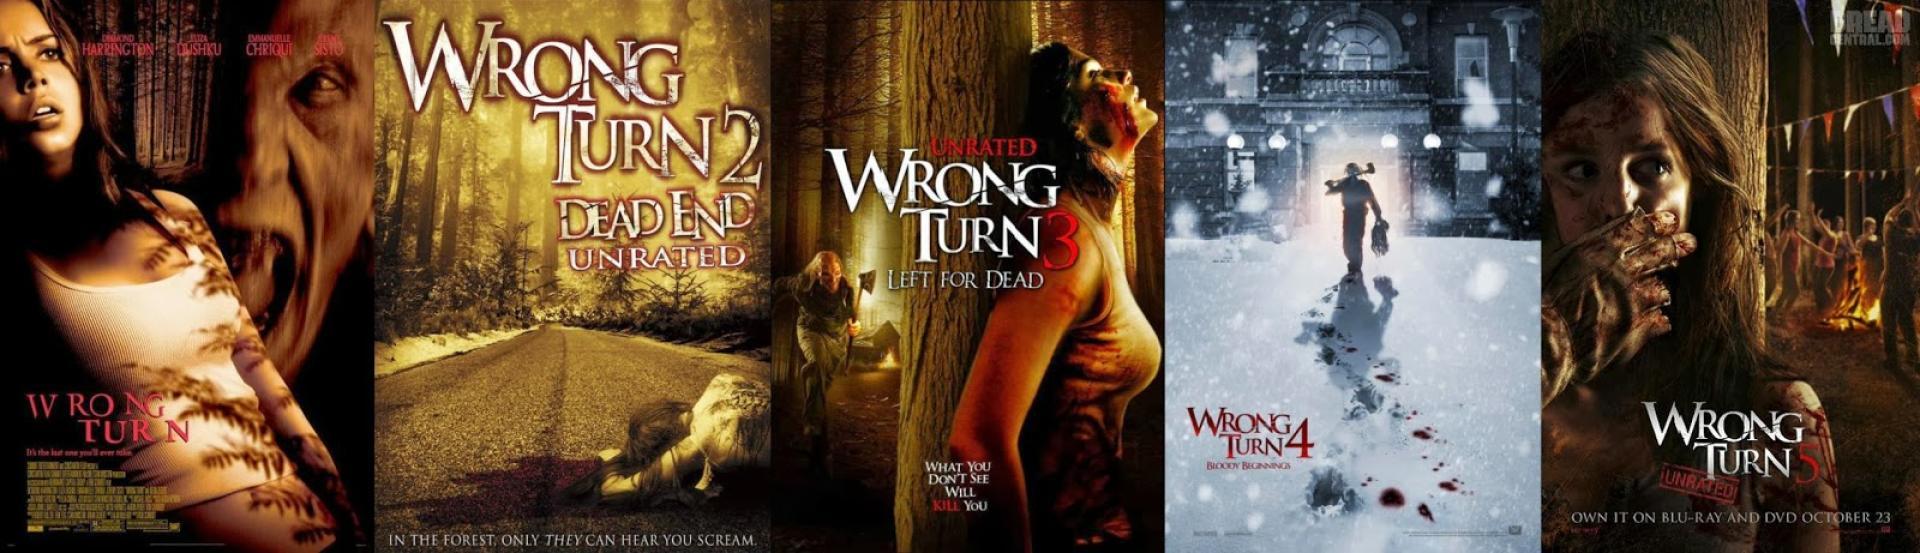 Wrong Turn 1-2 - Halálos kitérő 1-2 (2003/2005)